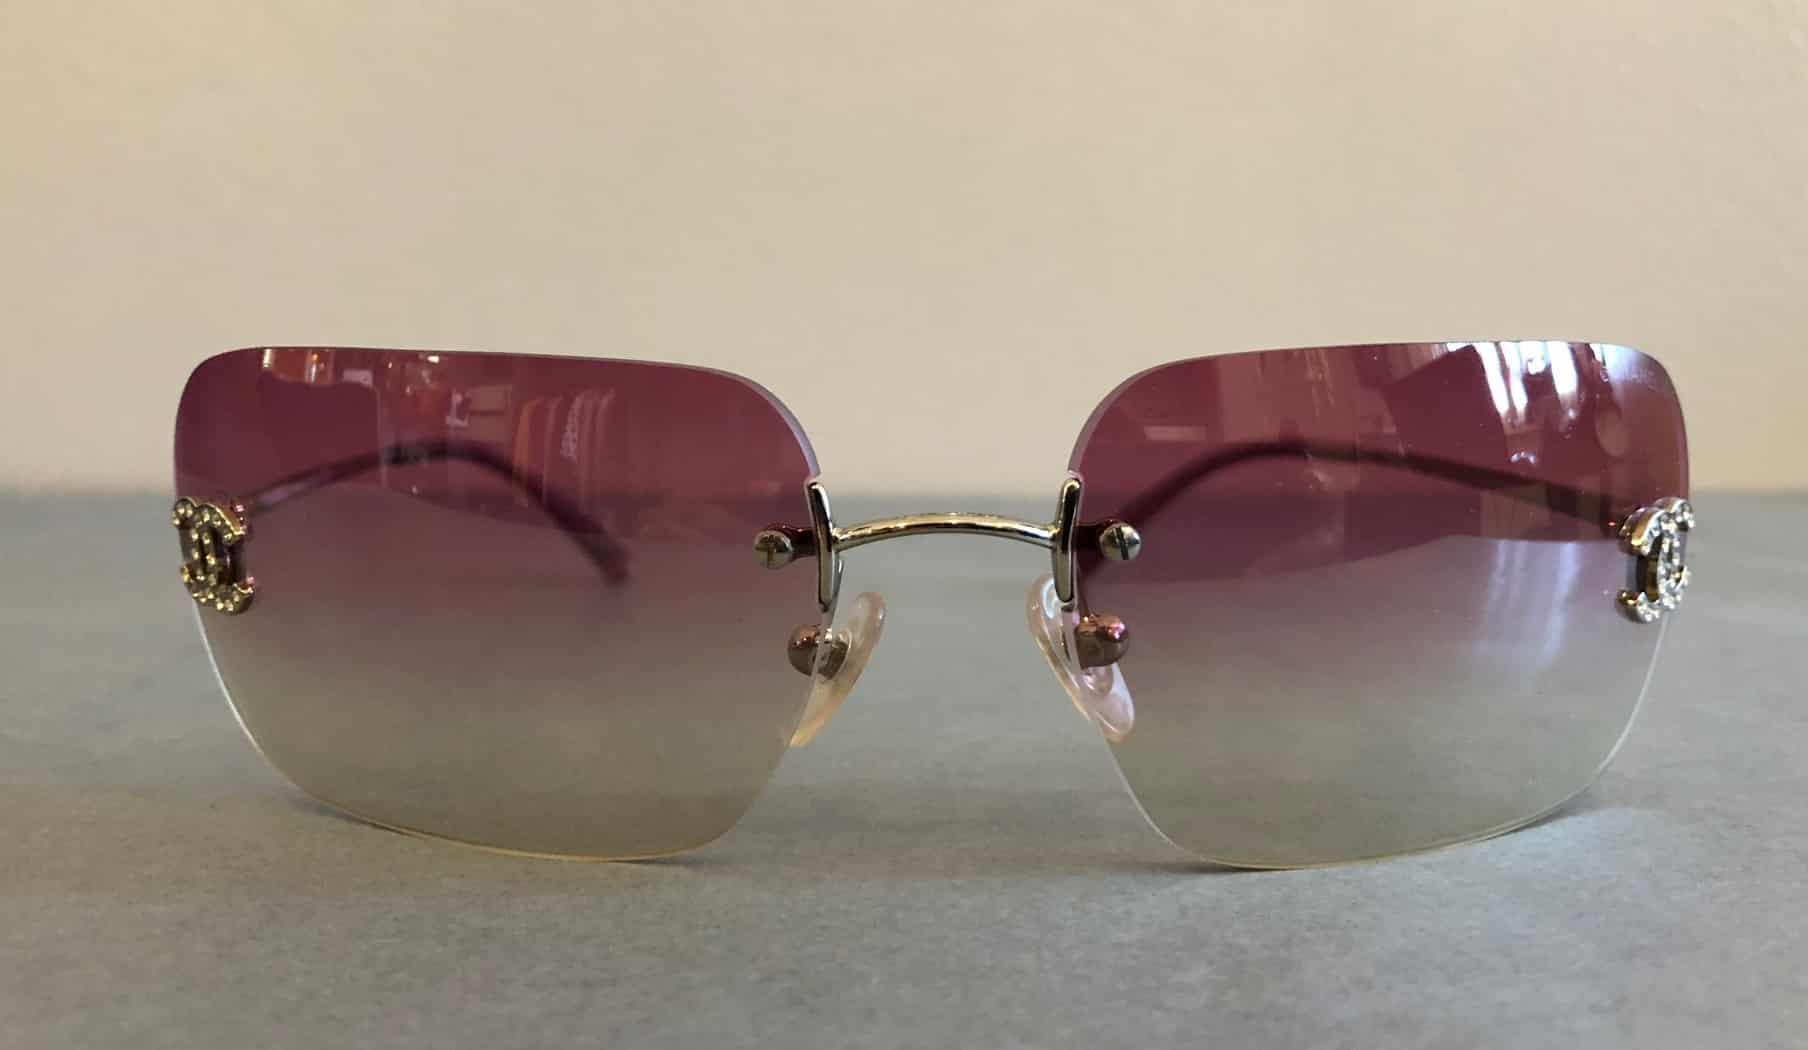 71576336256 CHANEL Sunglasses CC Aviators Rimless - Chelsea Vintage Couture